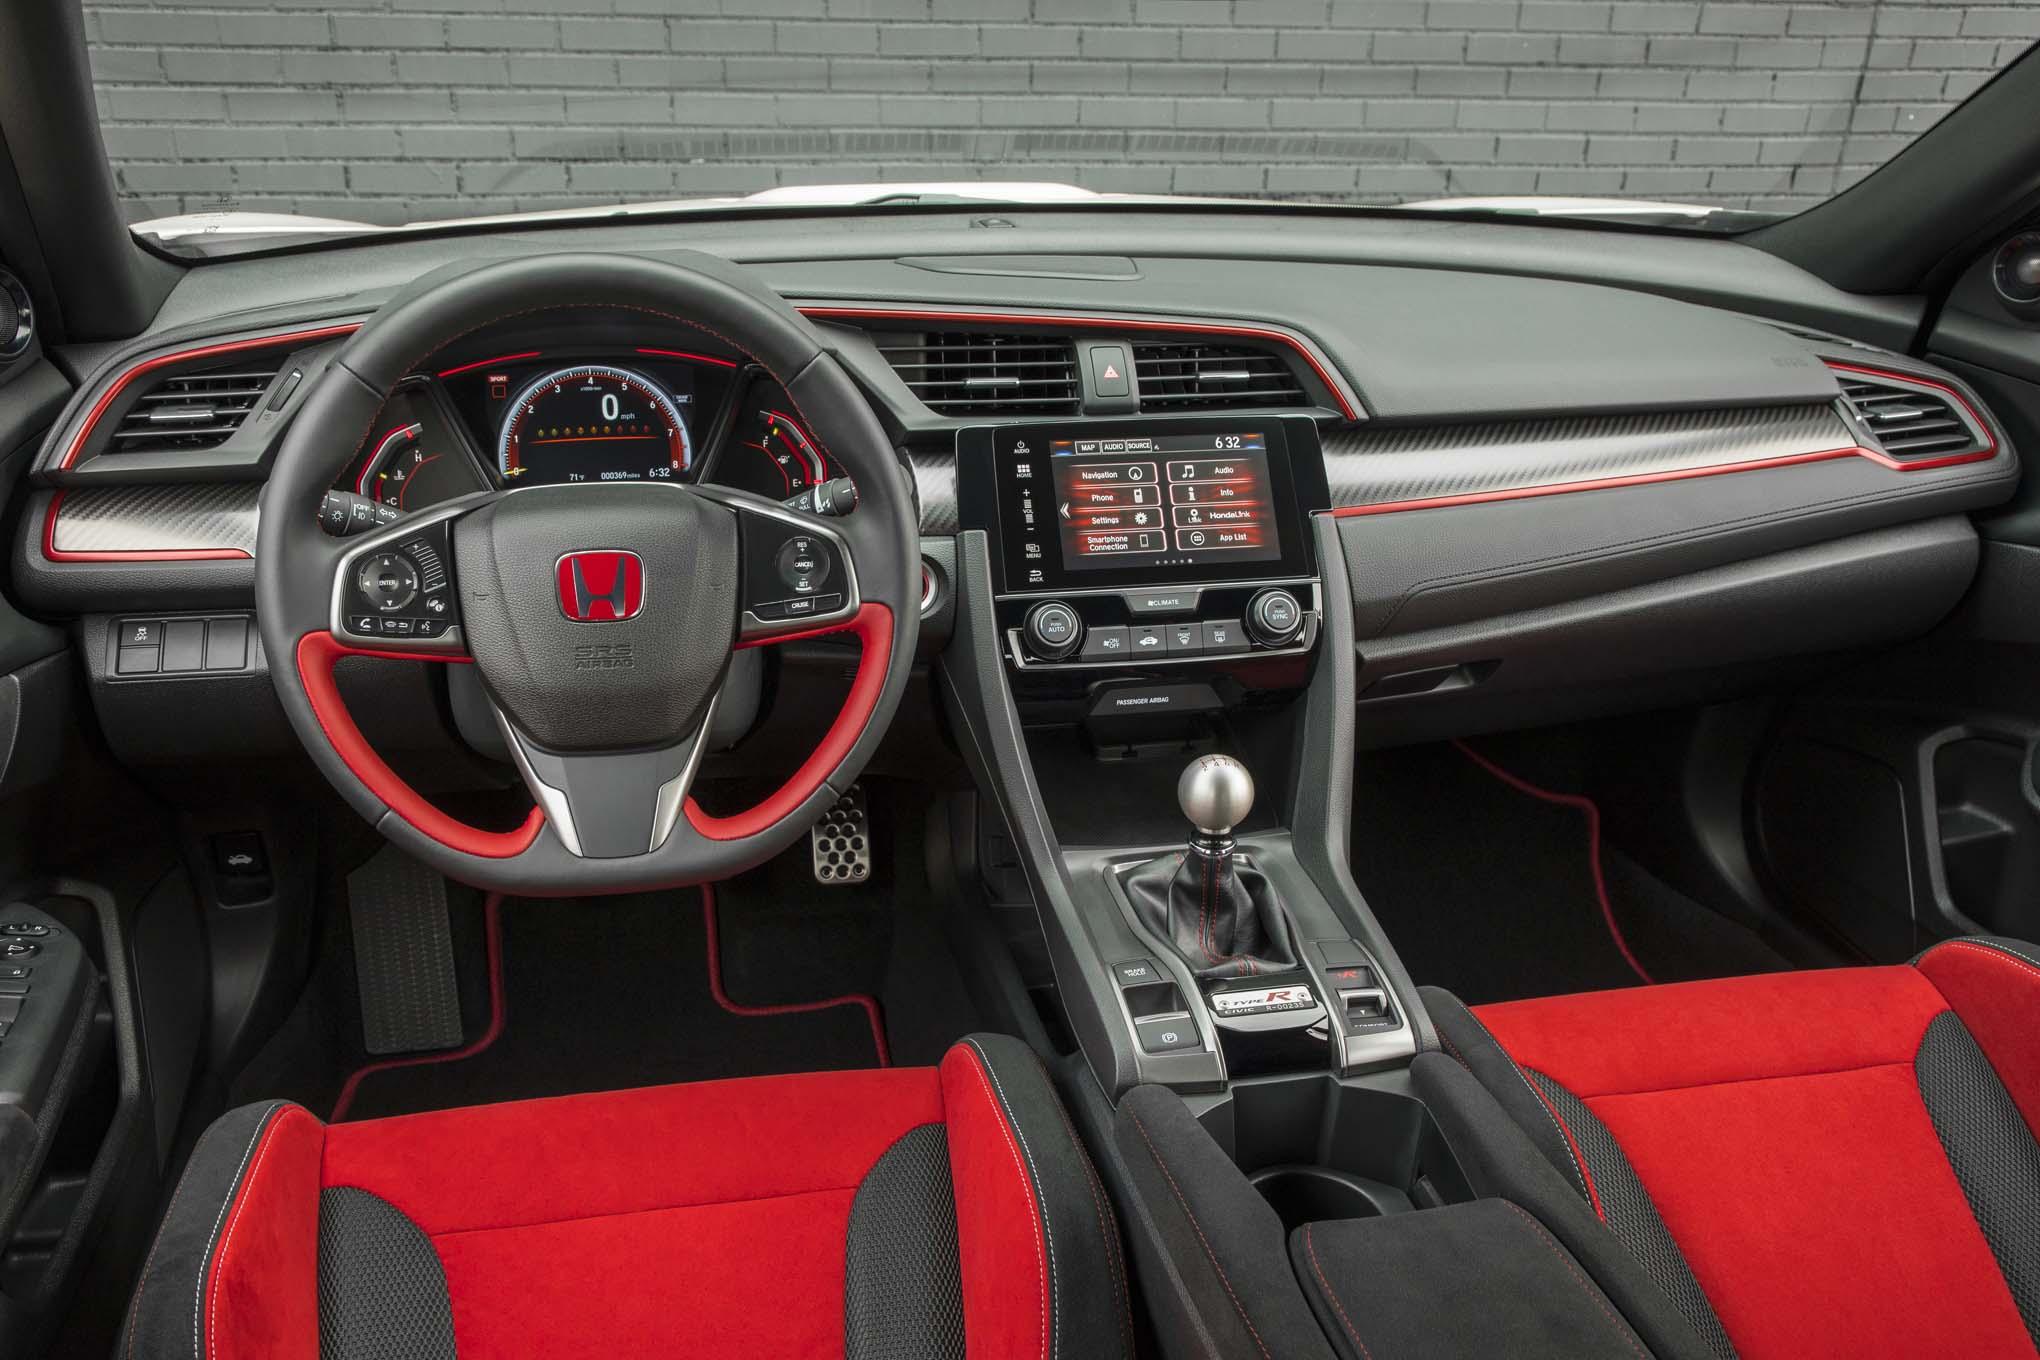 2017 honda civic type r first drive automobile magazine - 2017 honda civic type r interior ...